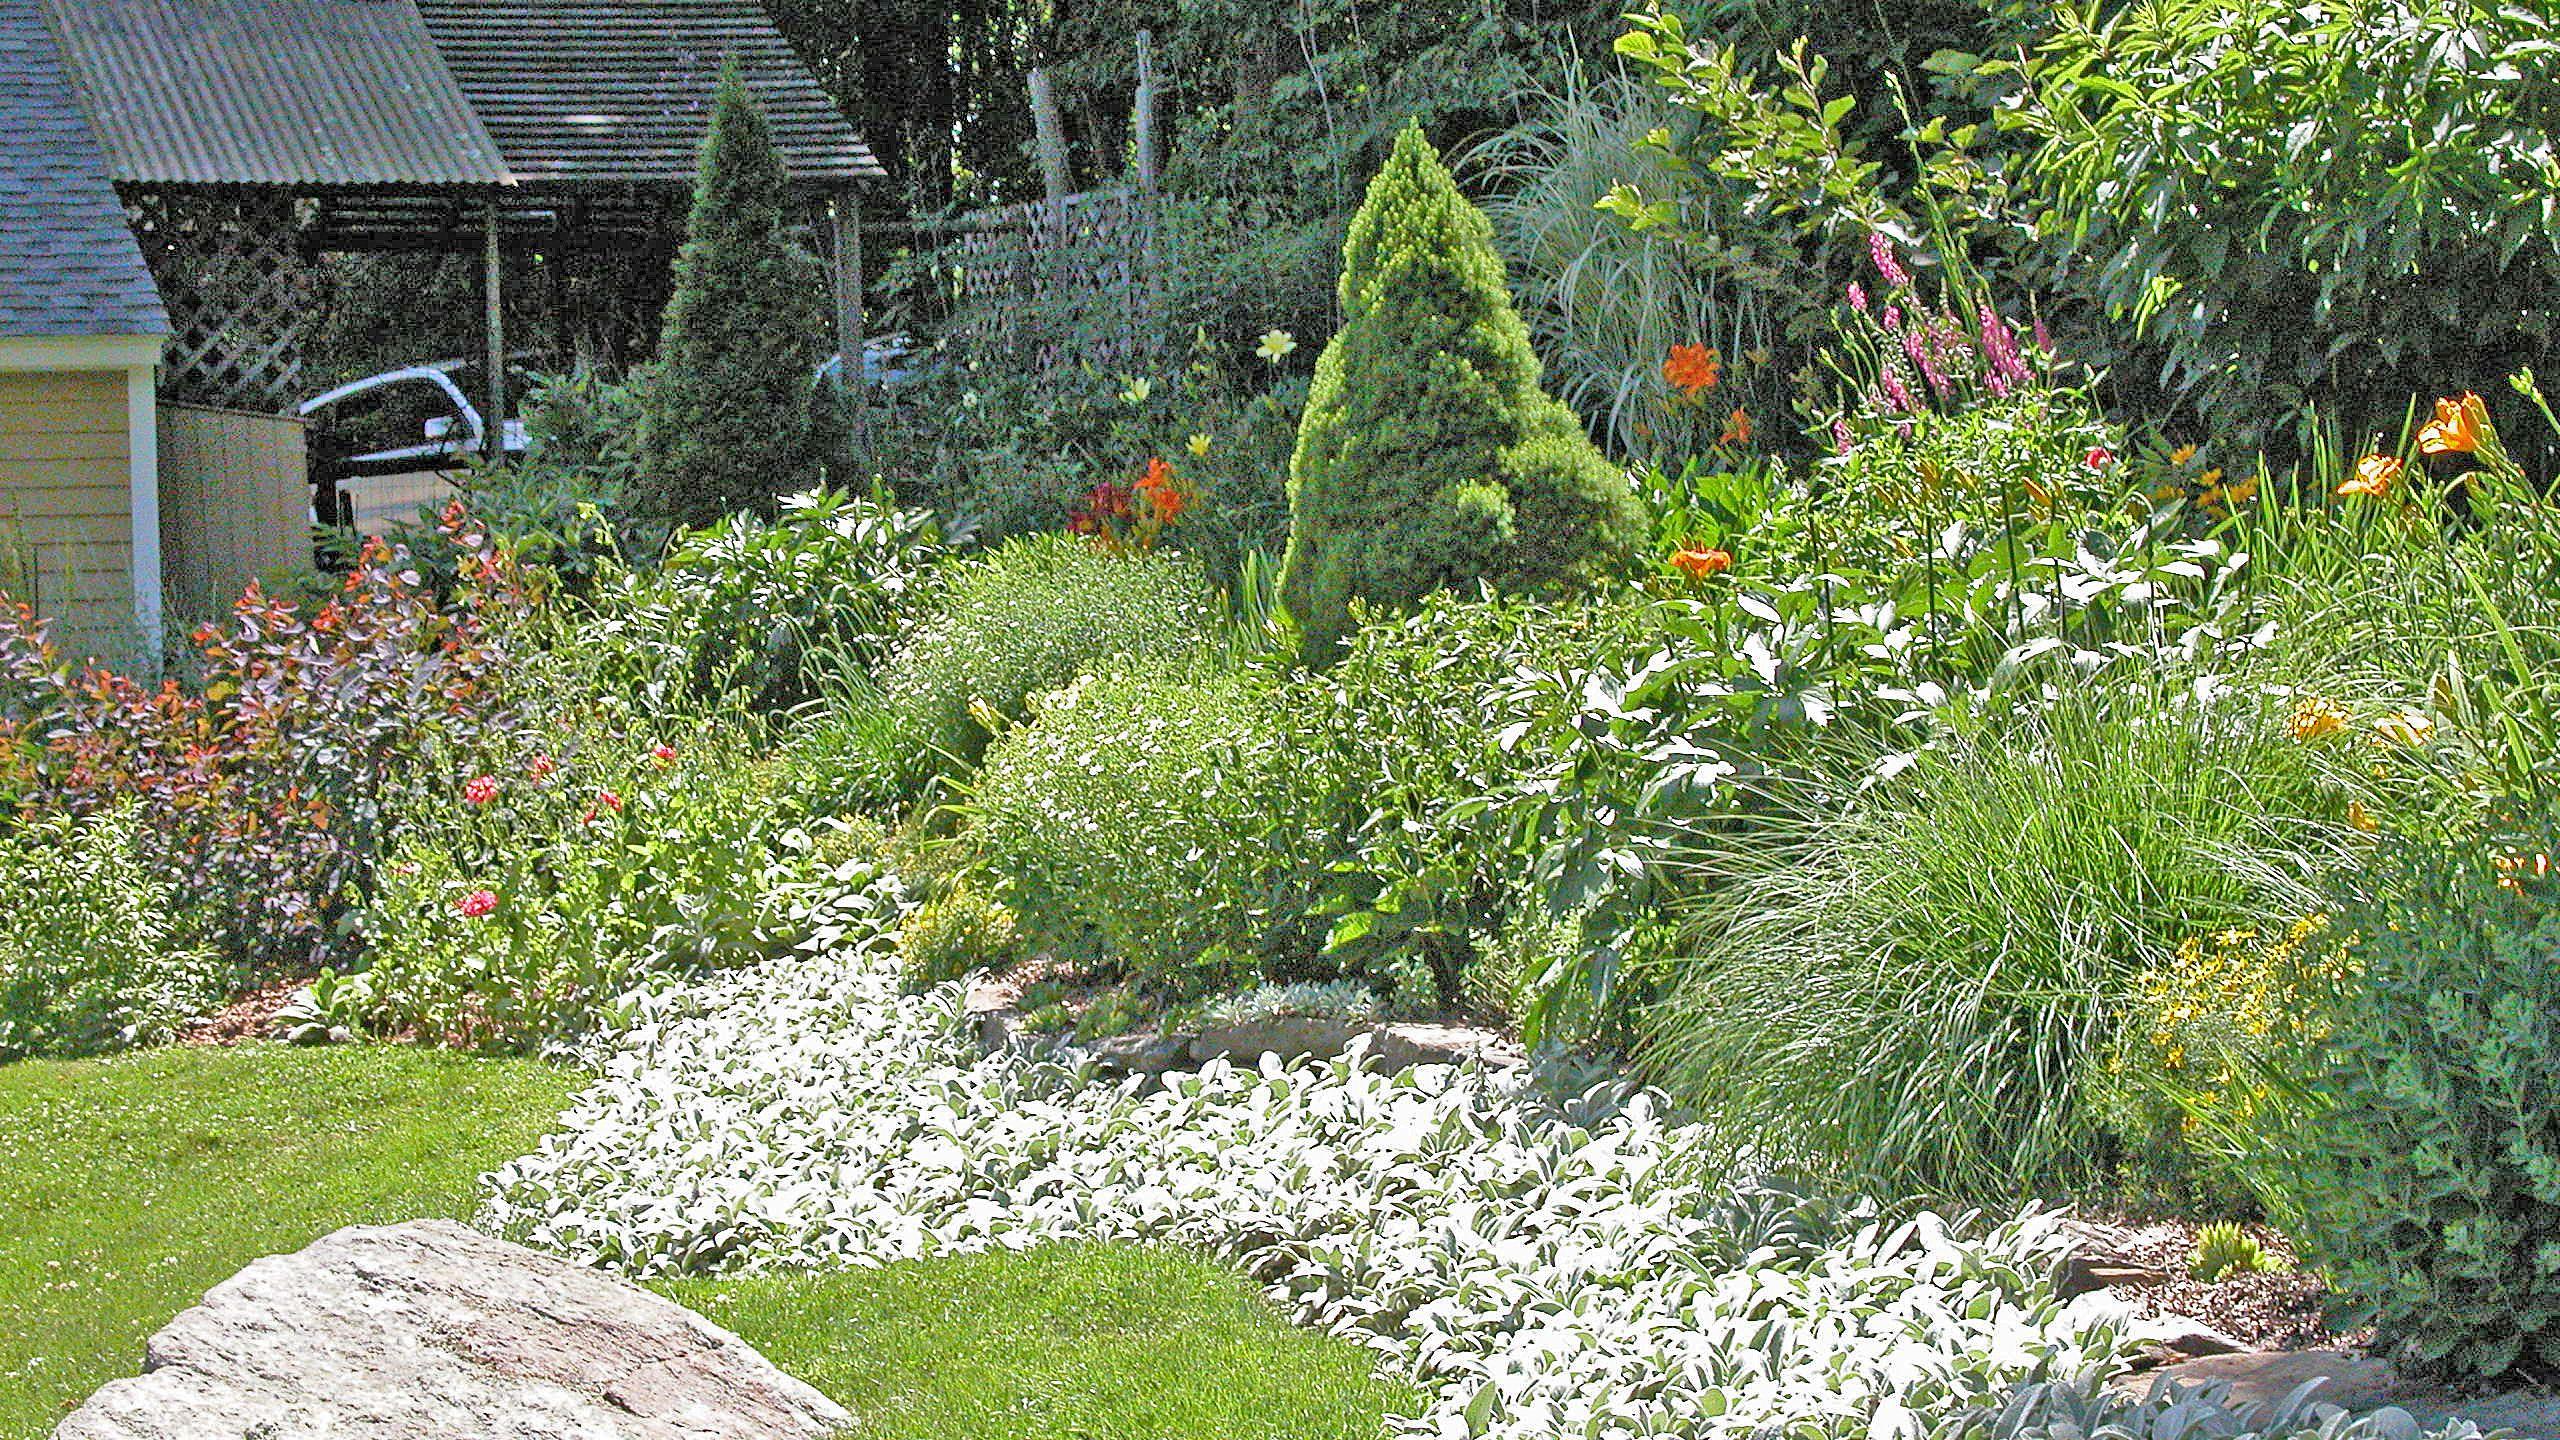 Steep Hill Backyard Landscaping Ideas - Home Design Ideas on Steep Hill Backyard Ideas id=32148